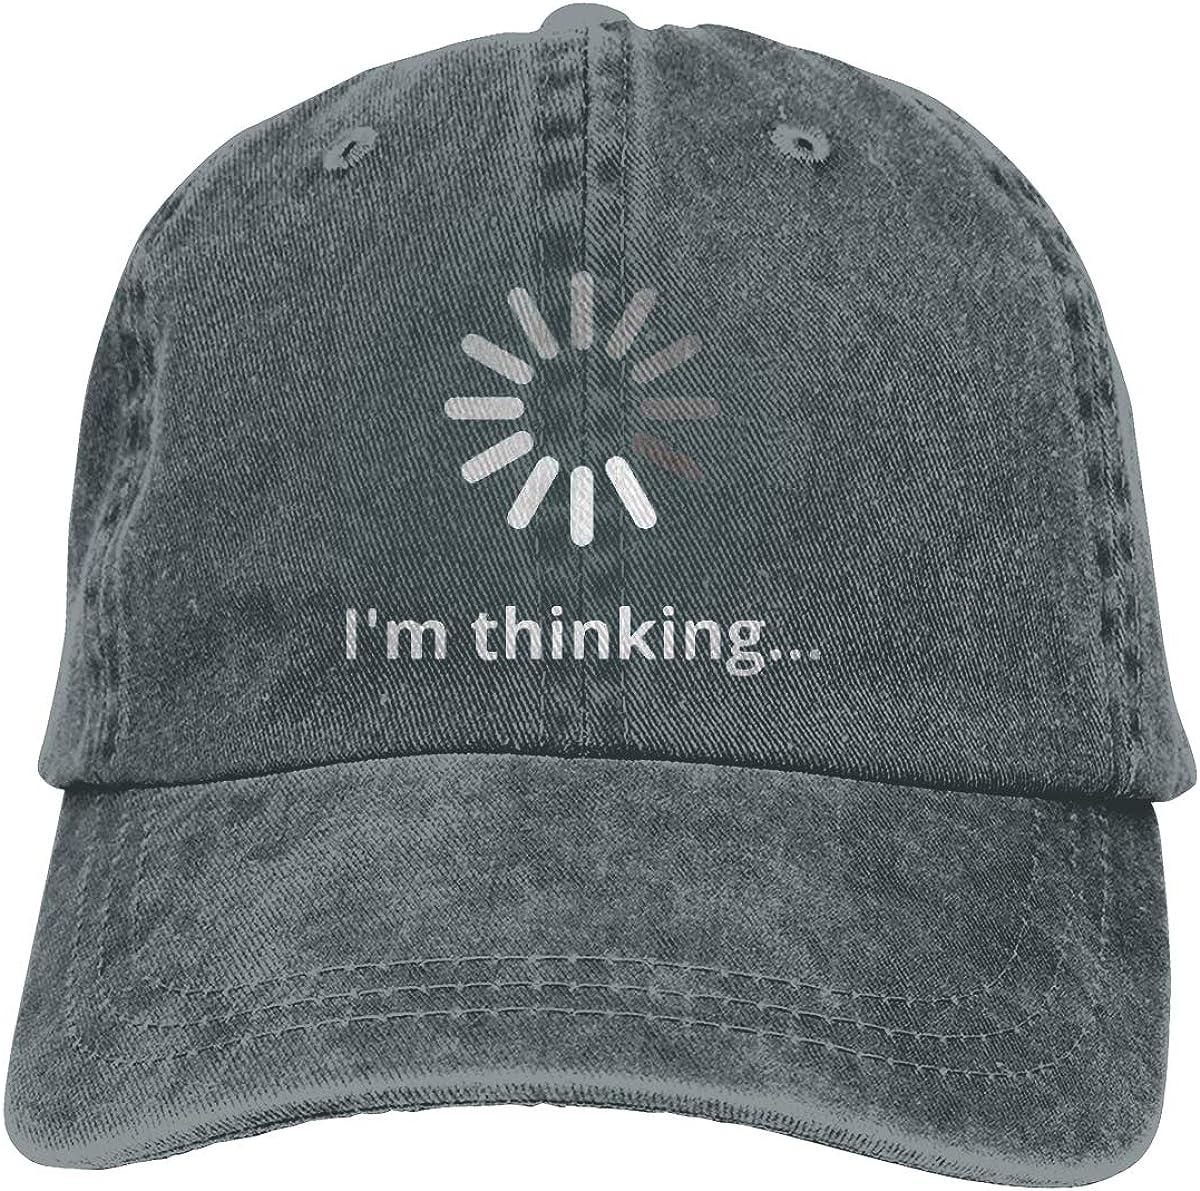 Im Thinking Unisex Baseball Cap Cotton Denim Great Adjustable Sun Hat for Men Women Youth